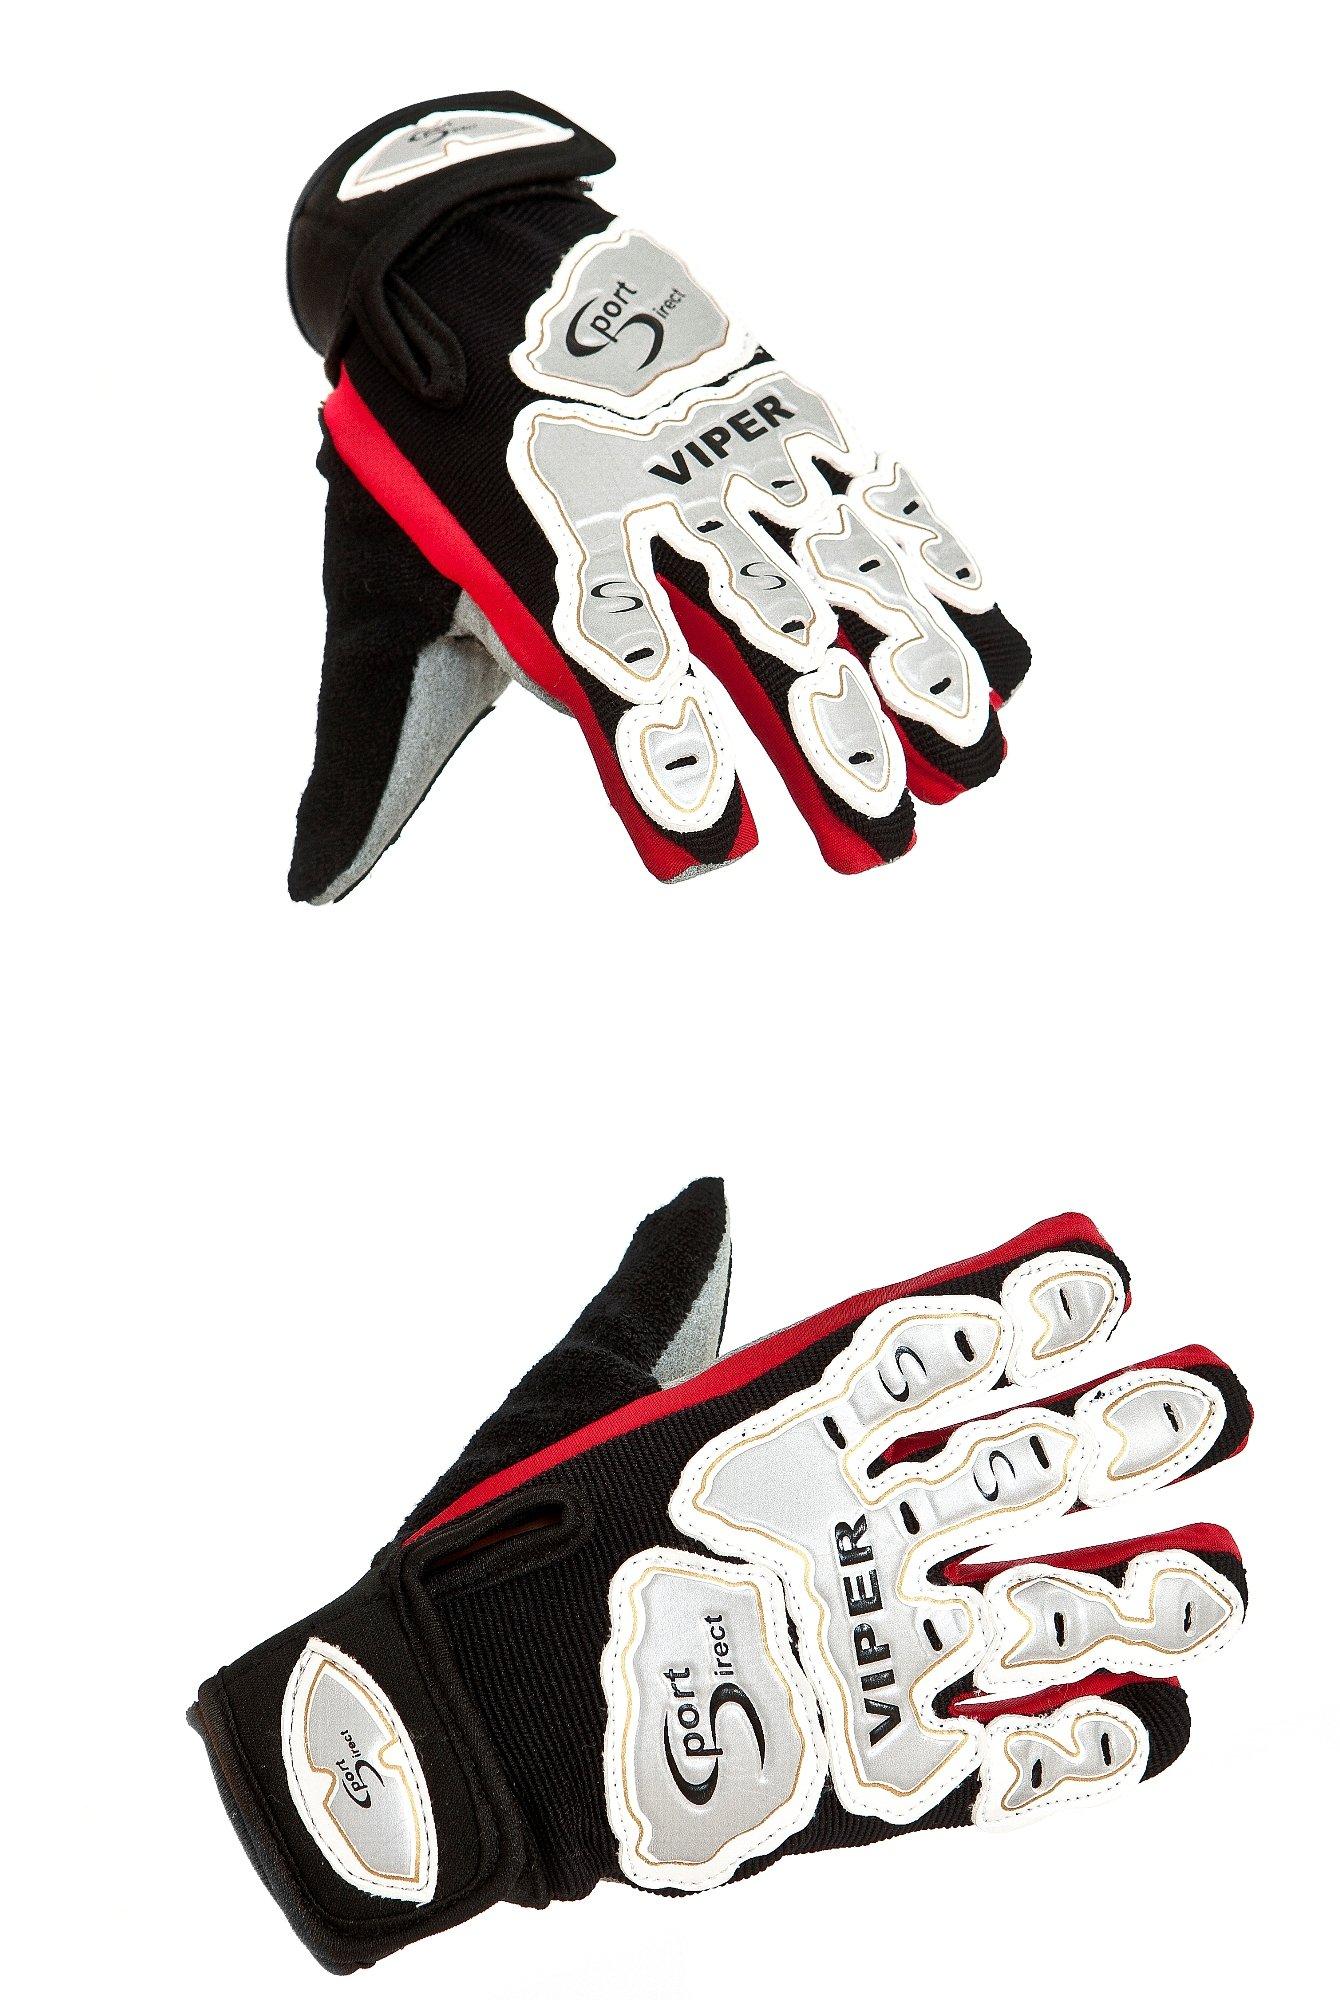 Junior Bmx Viper Bike Gloves by Sport DirectTM (Image #2)